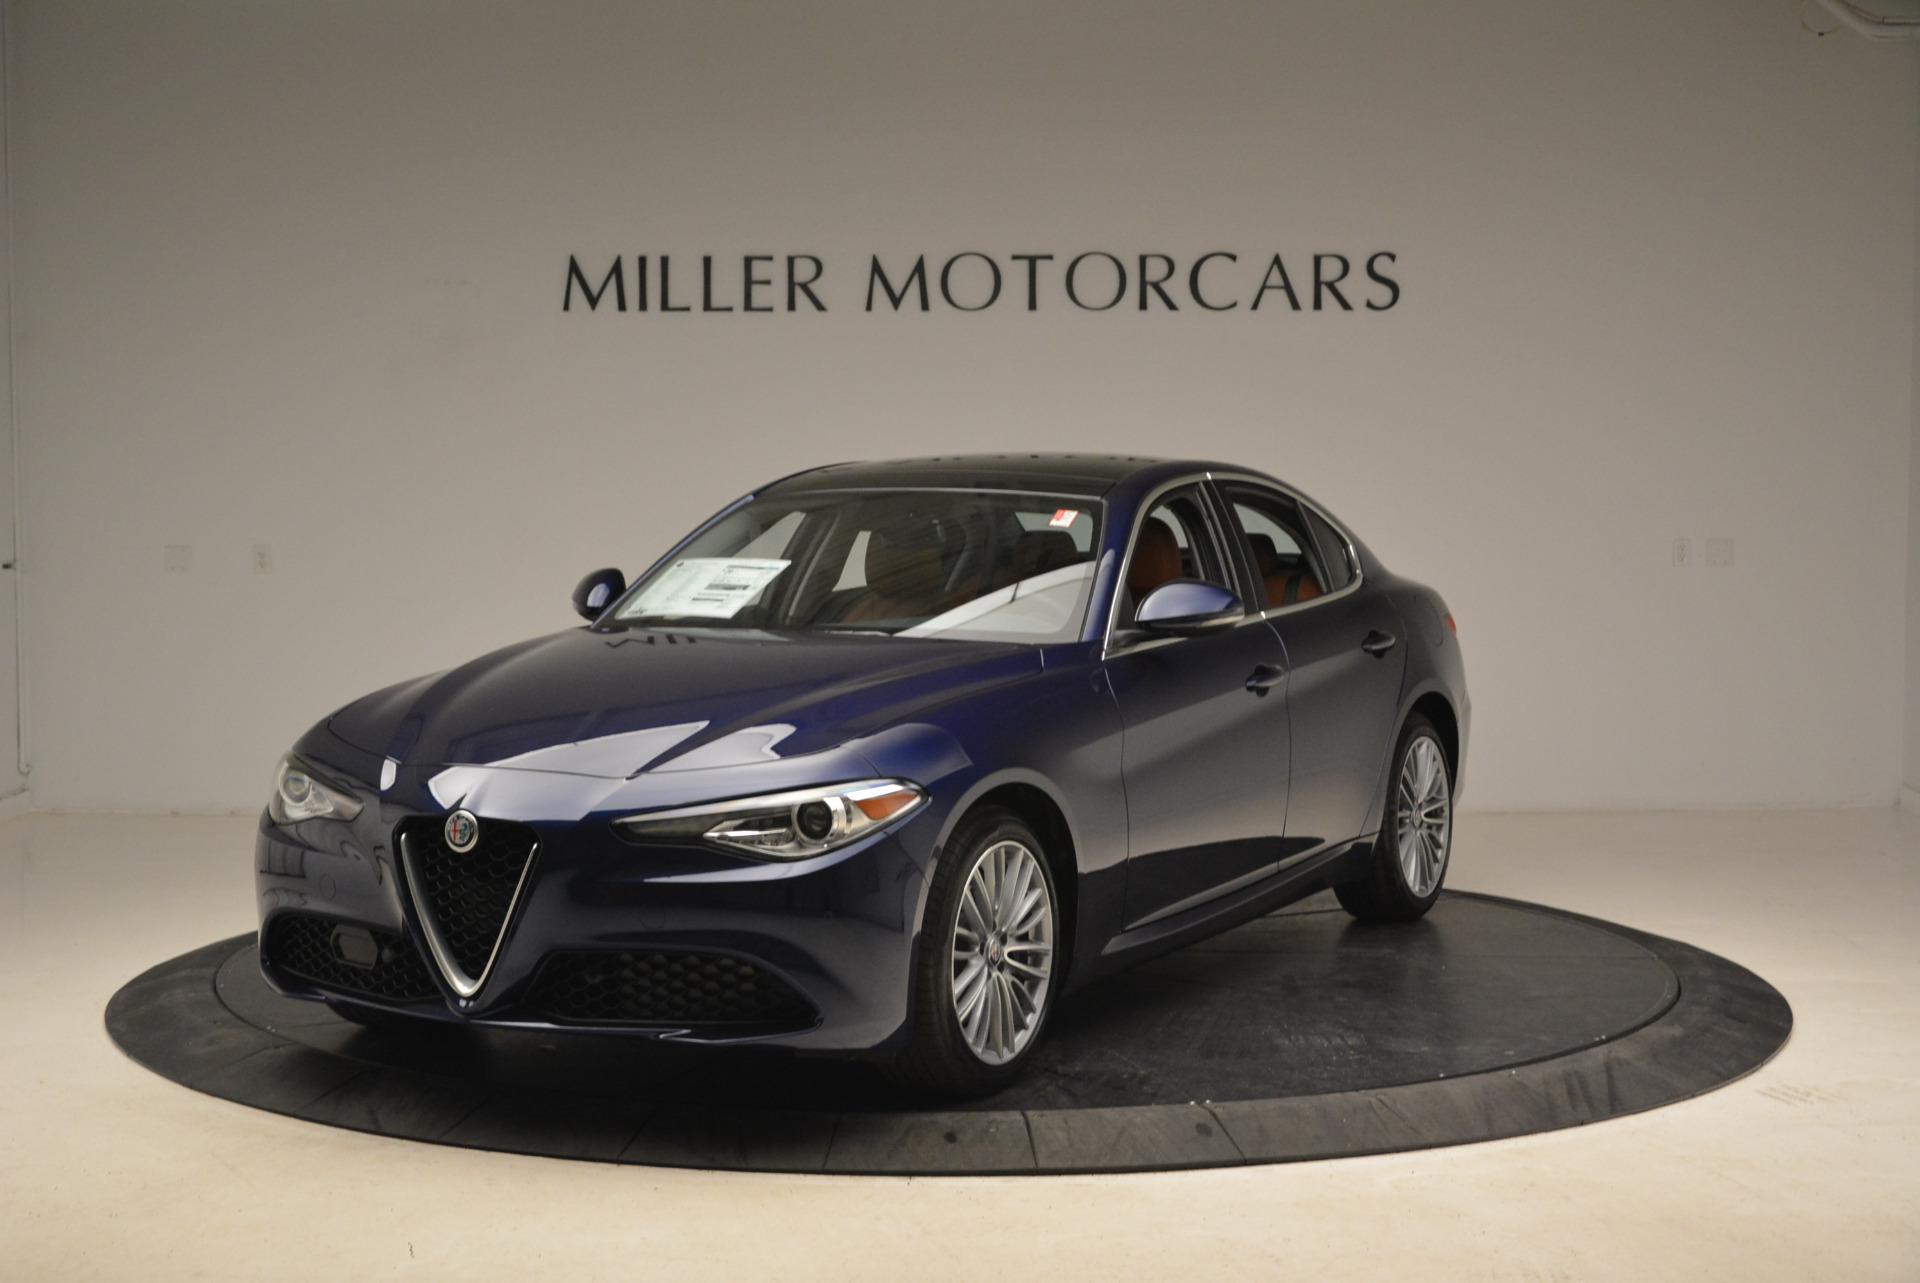 New 2018 Alfa Romeo Giulia Ti Lusso Q4 for sale Sold at Rolls-Royce Motor Cars Greenwich in Greenwich CT 06830 1